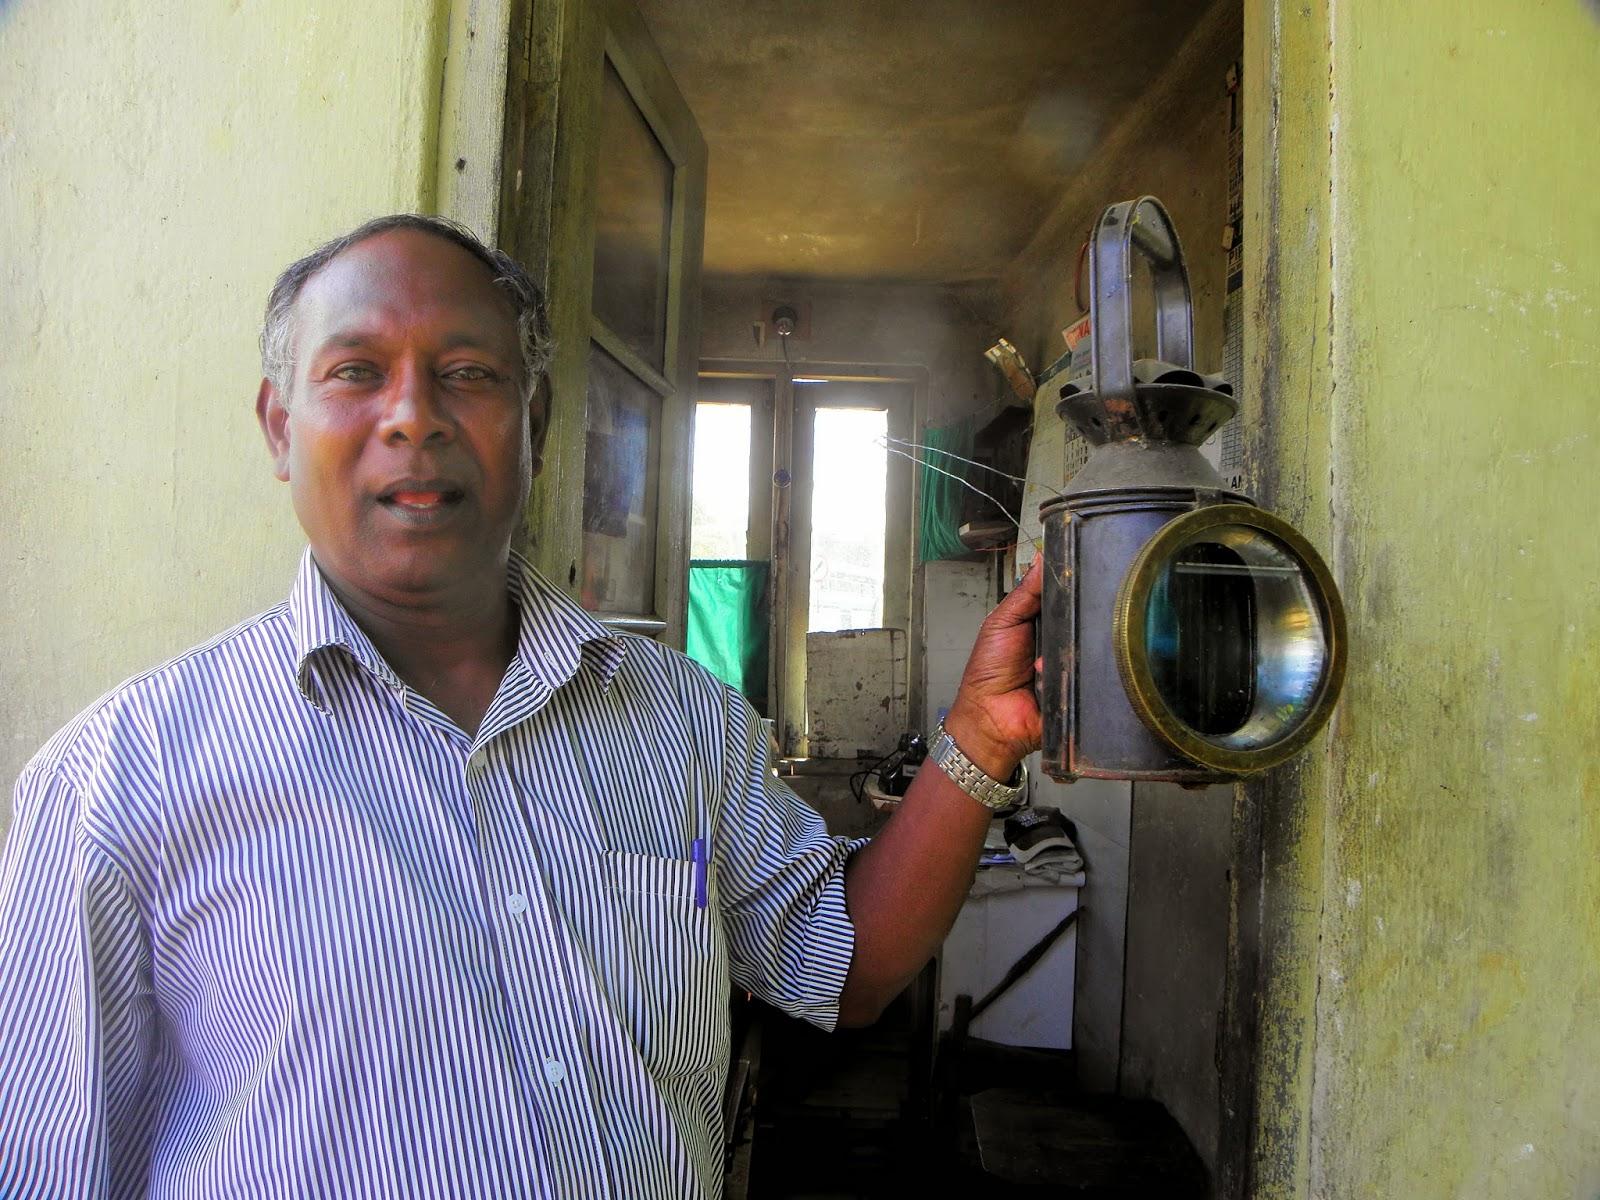 getambe, signal man, railway, Sri Lanka railway,